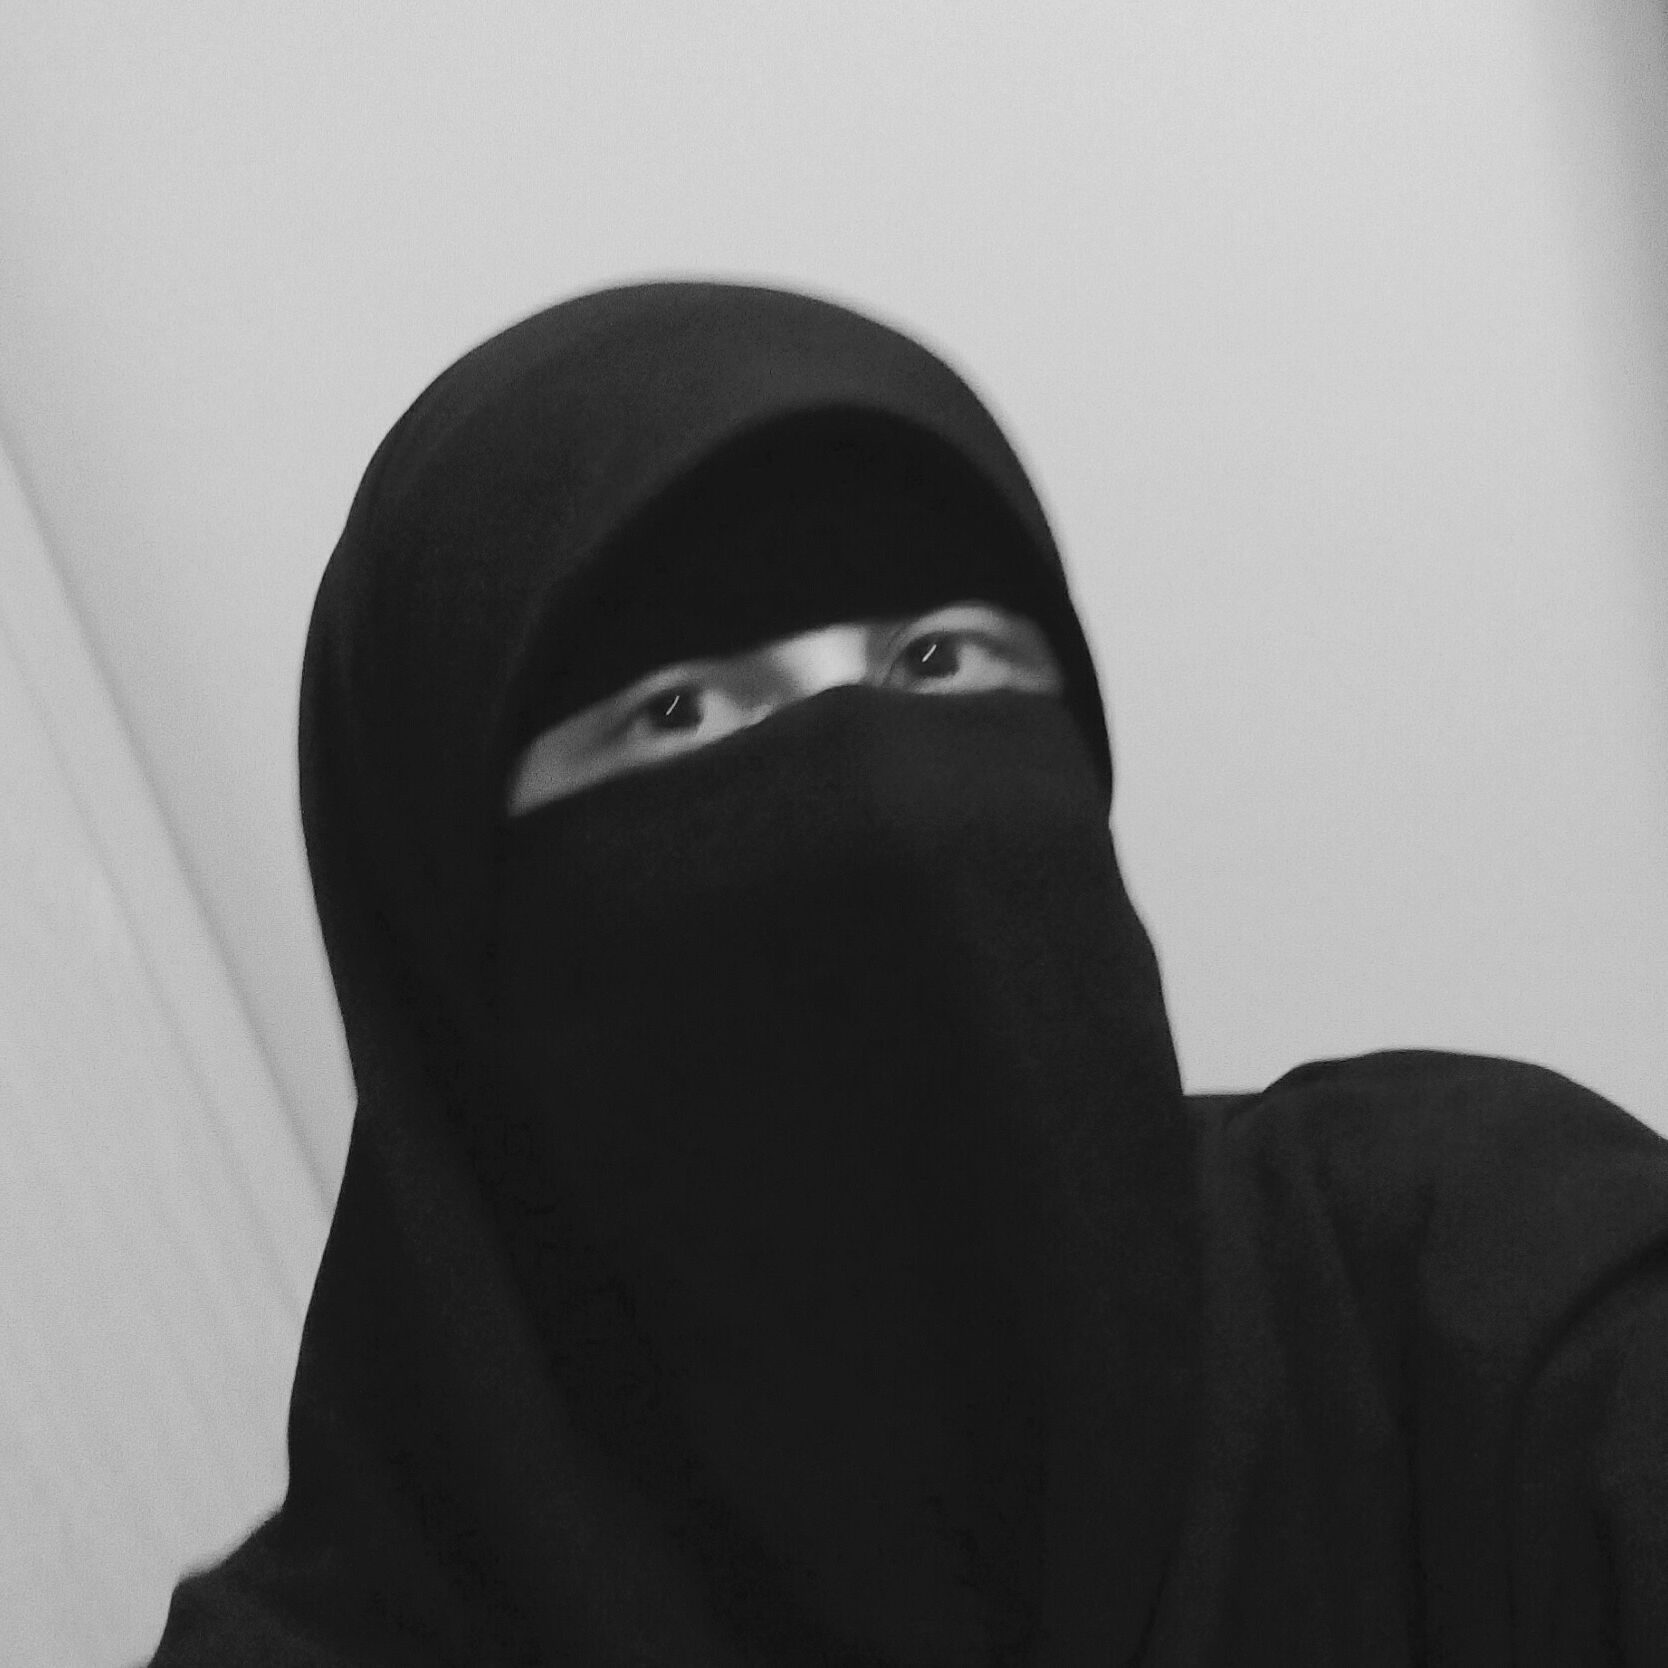 حسناء حمدي فتحي Headshot